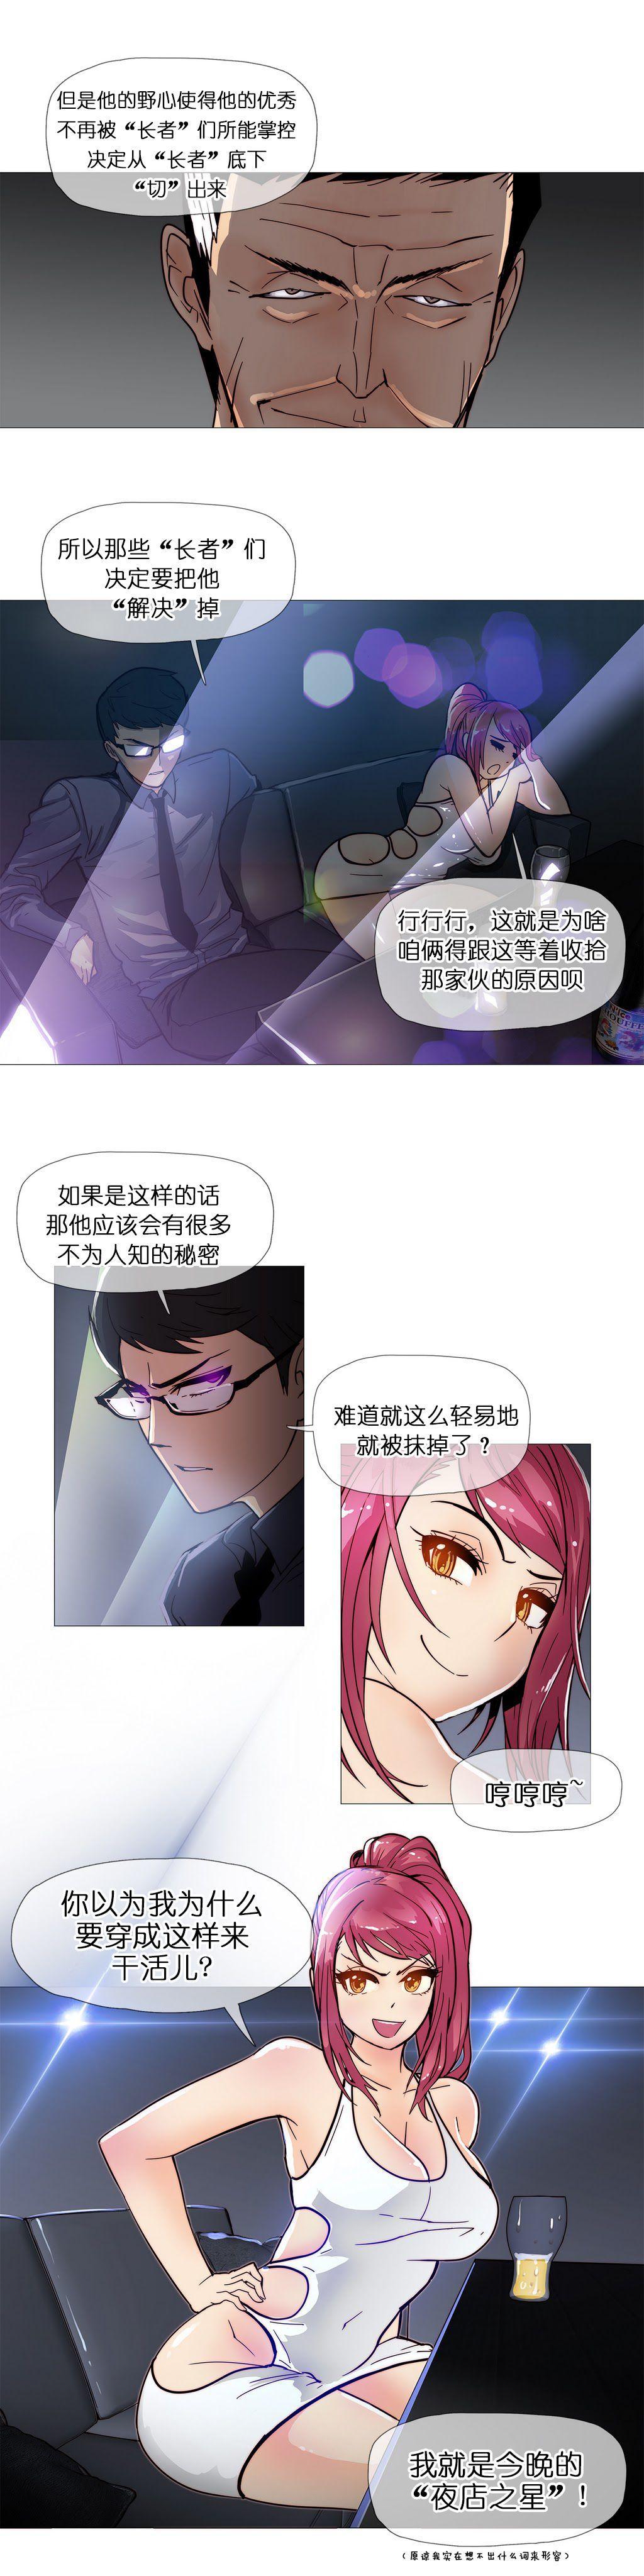 HouseHold Affairs 【卞赤鲤个人汉化】1~33话(持续更新中) 179